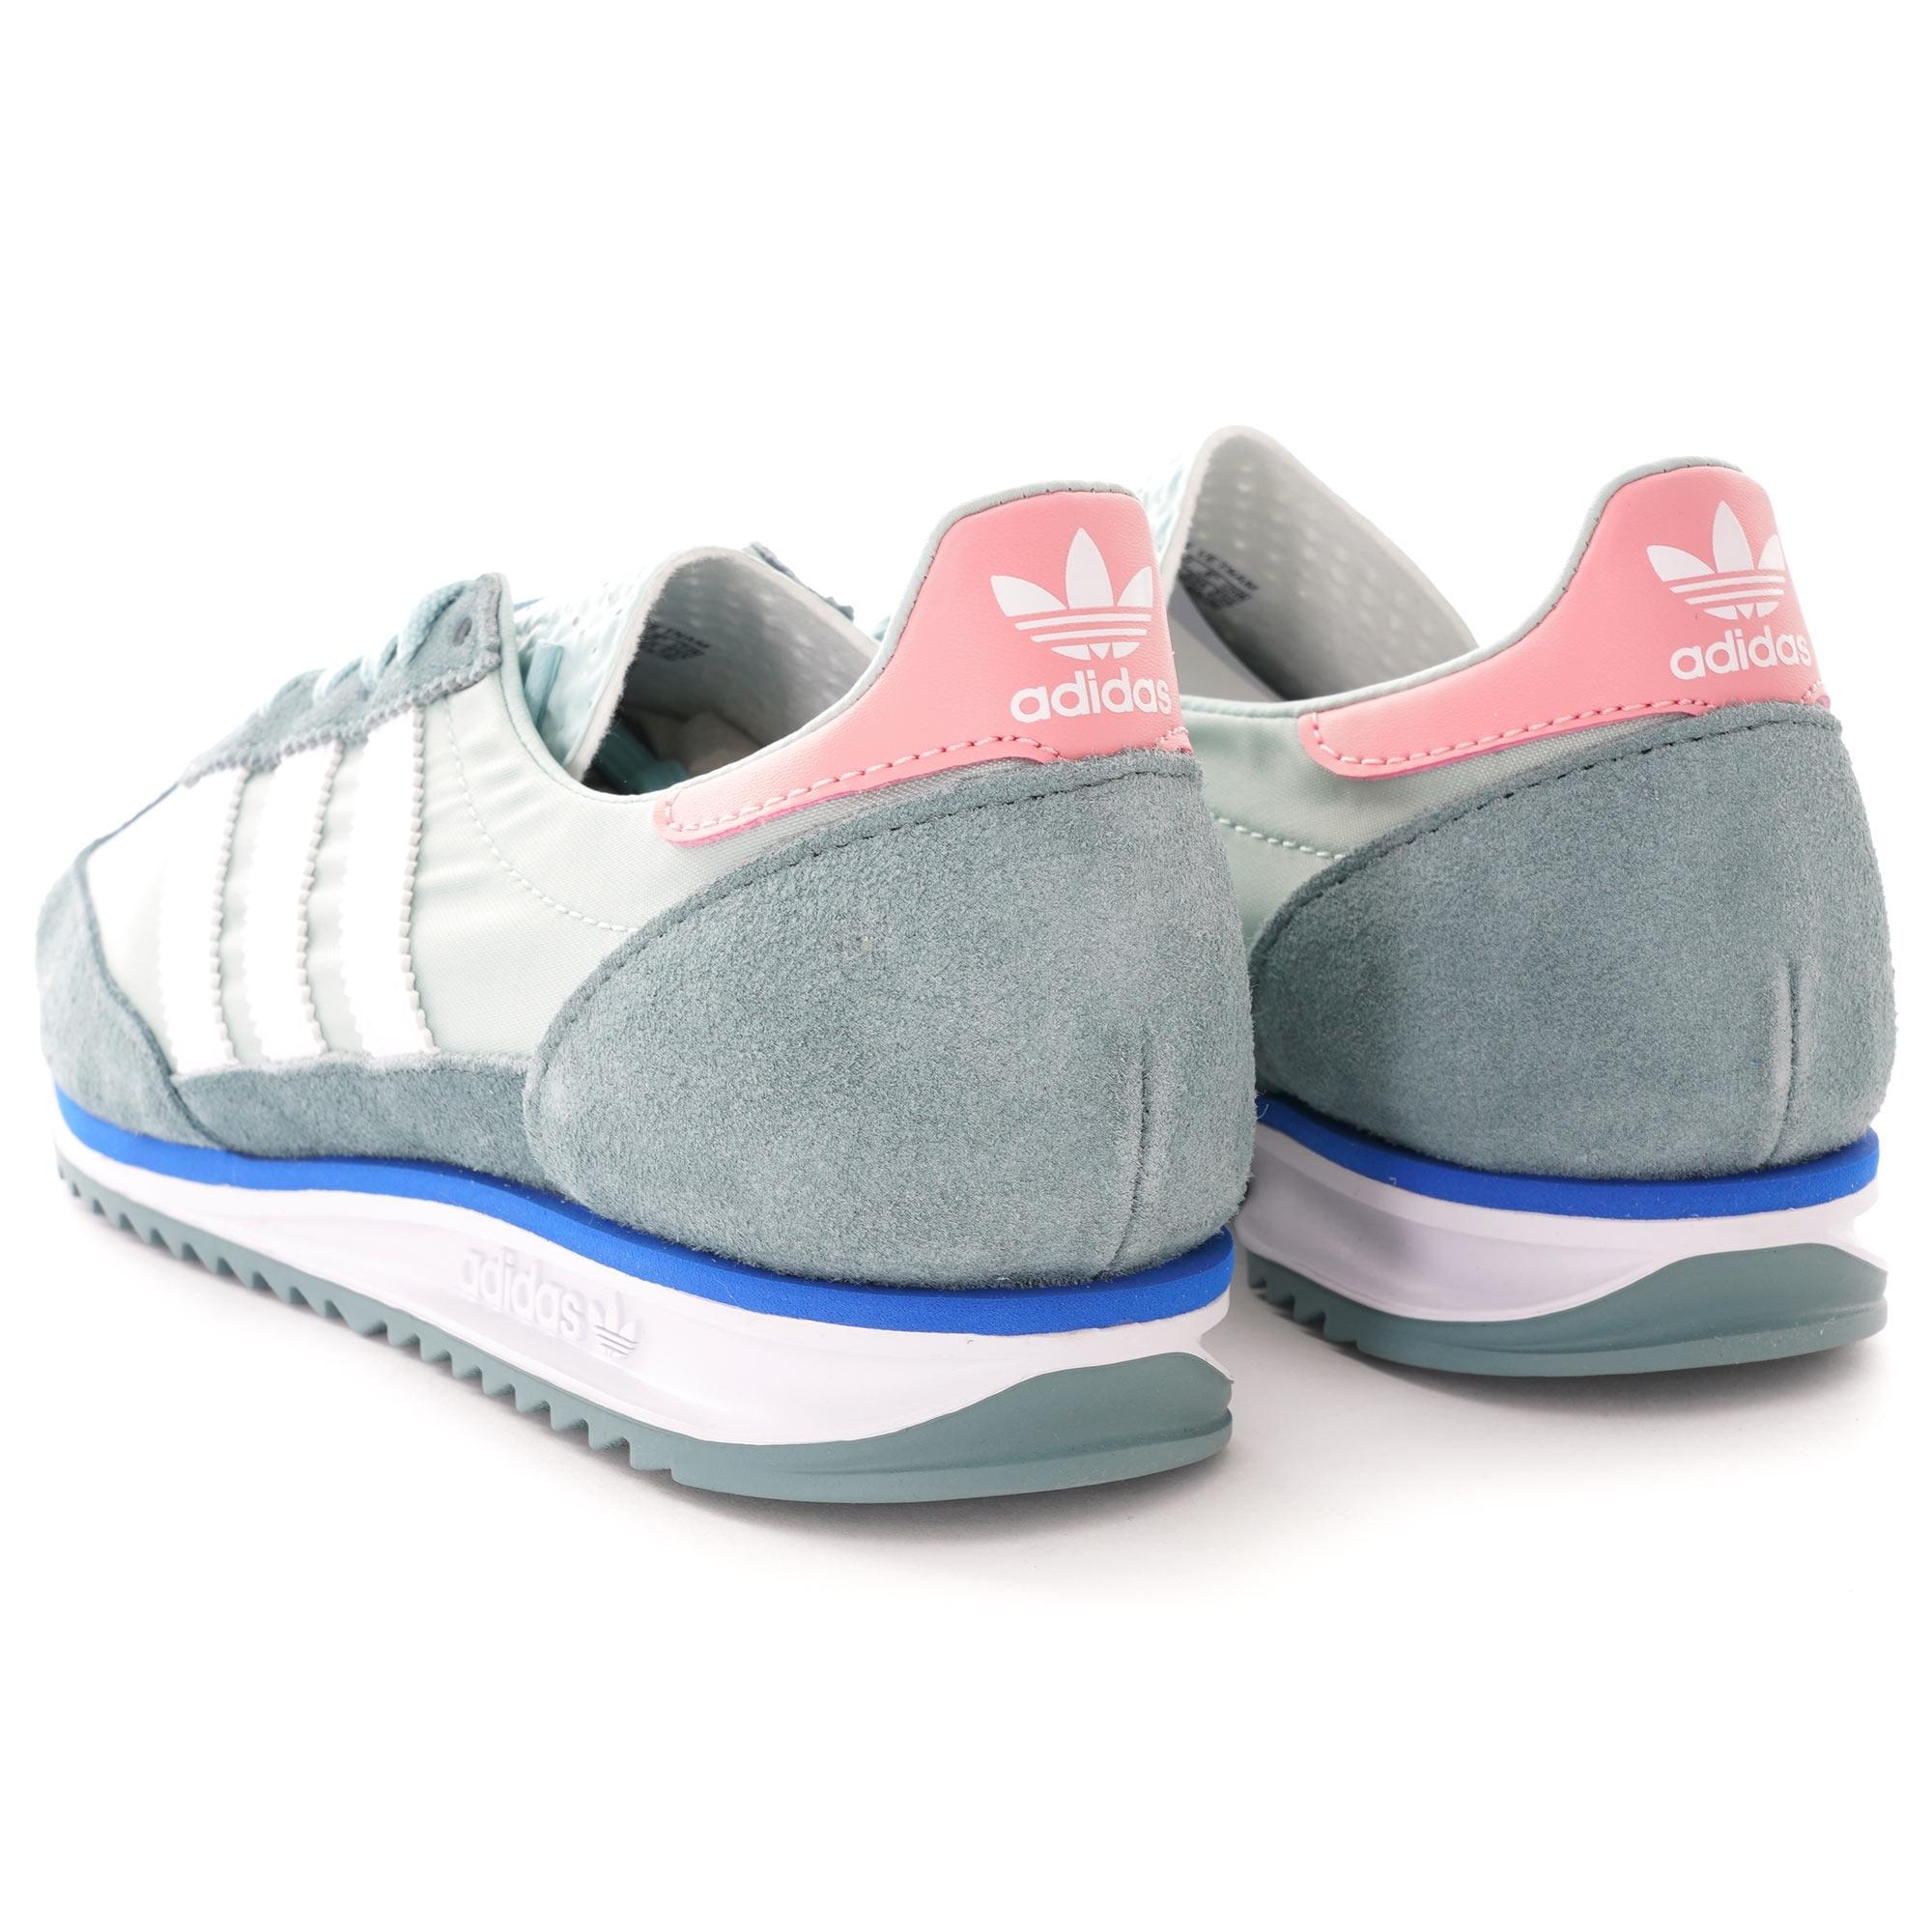 adidas Originals SL 72 | Green | EG5348